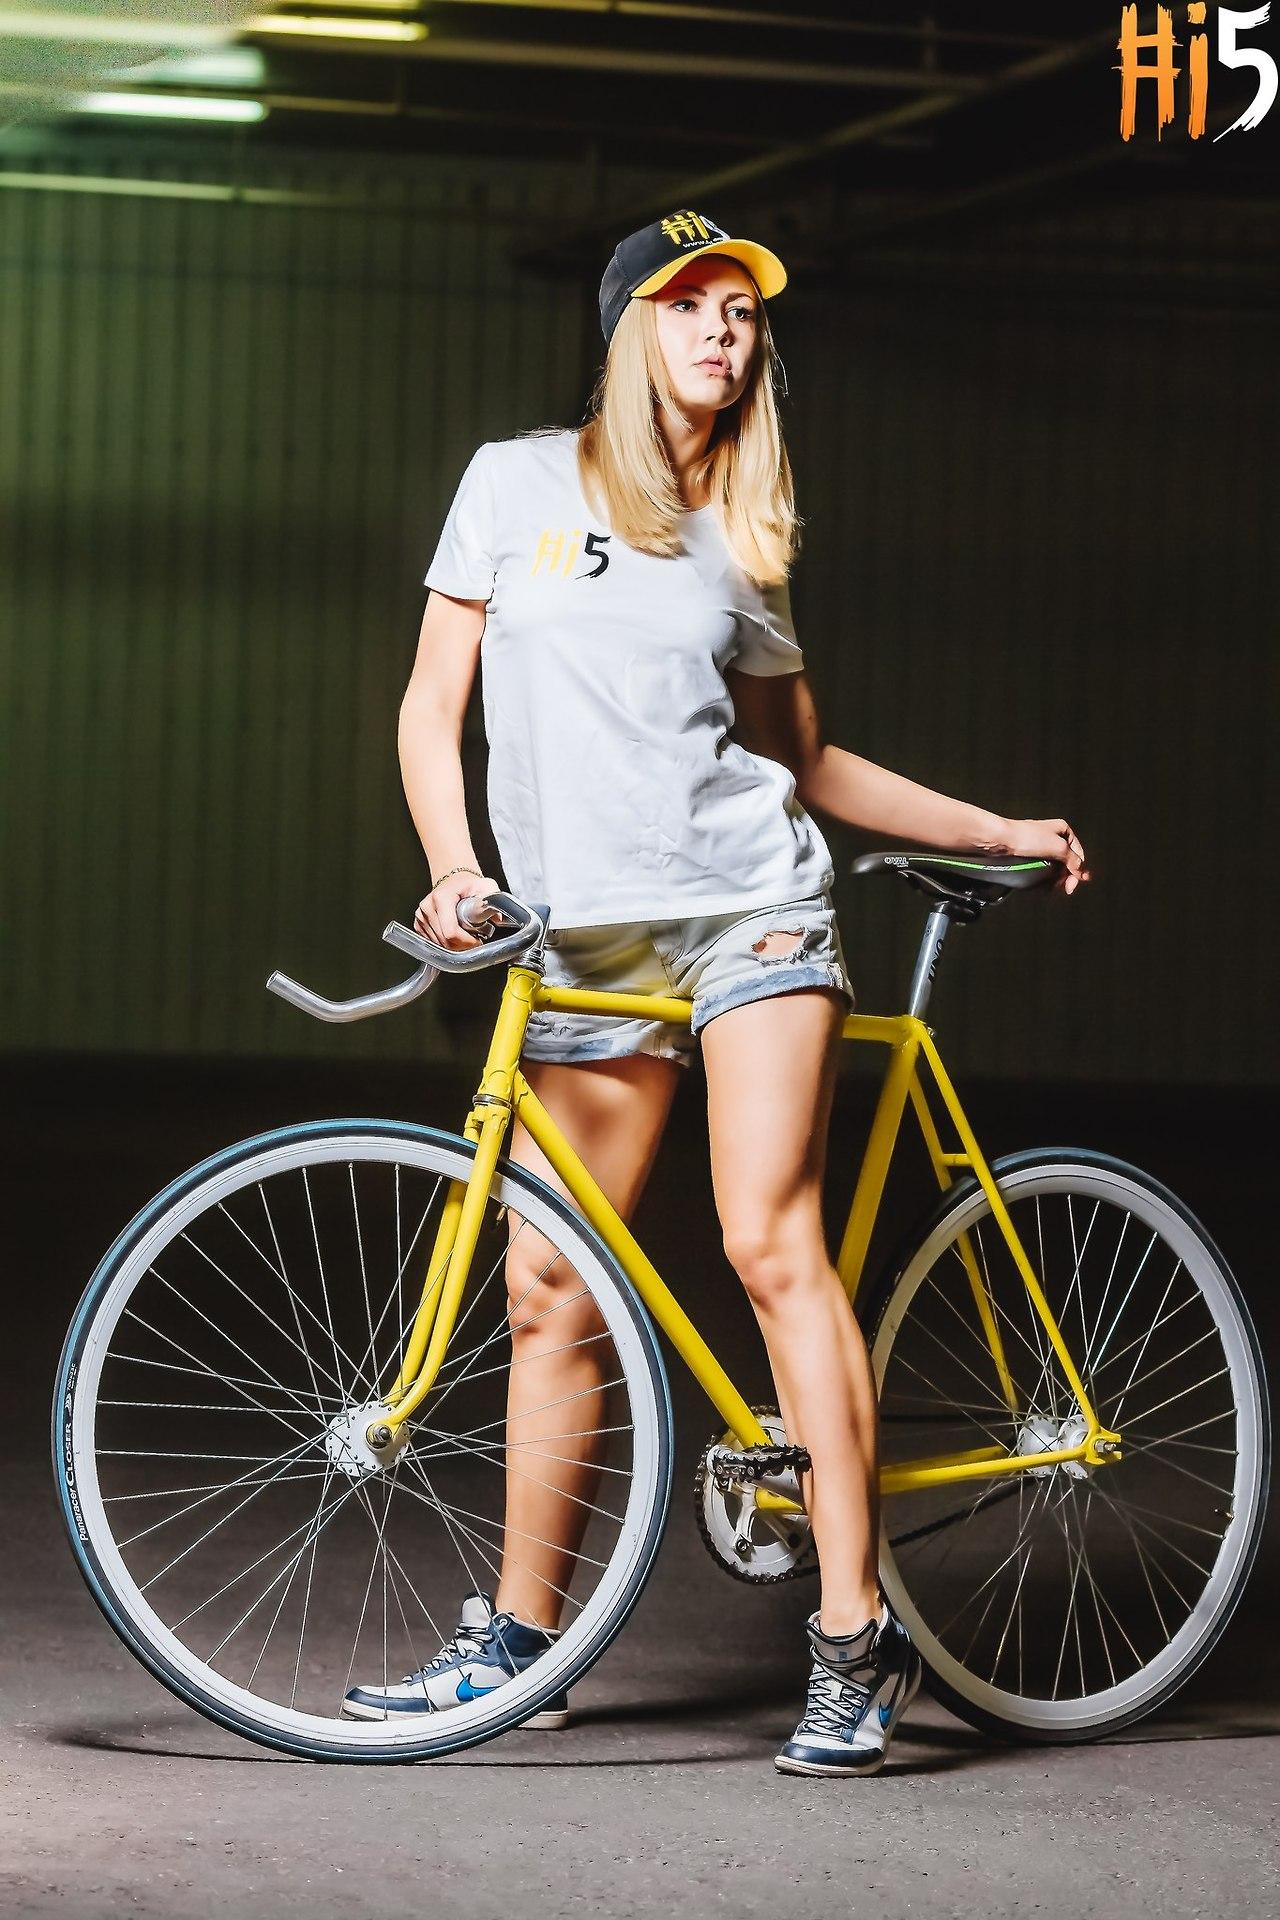 Anna Ayzen Bikegirls Blog 4.jpg